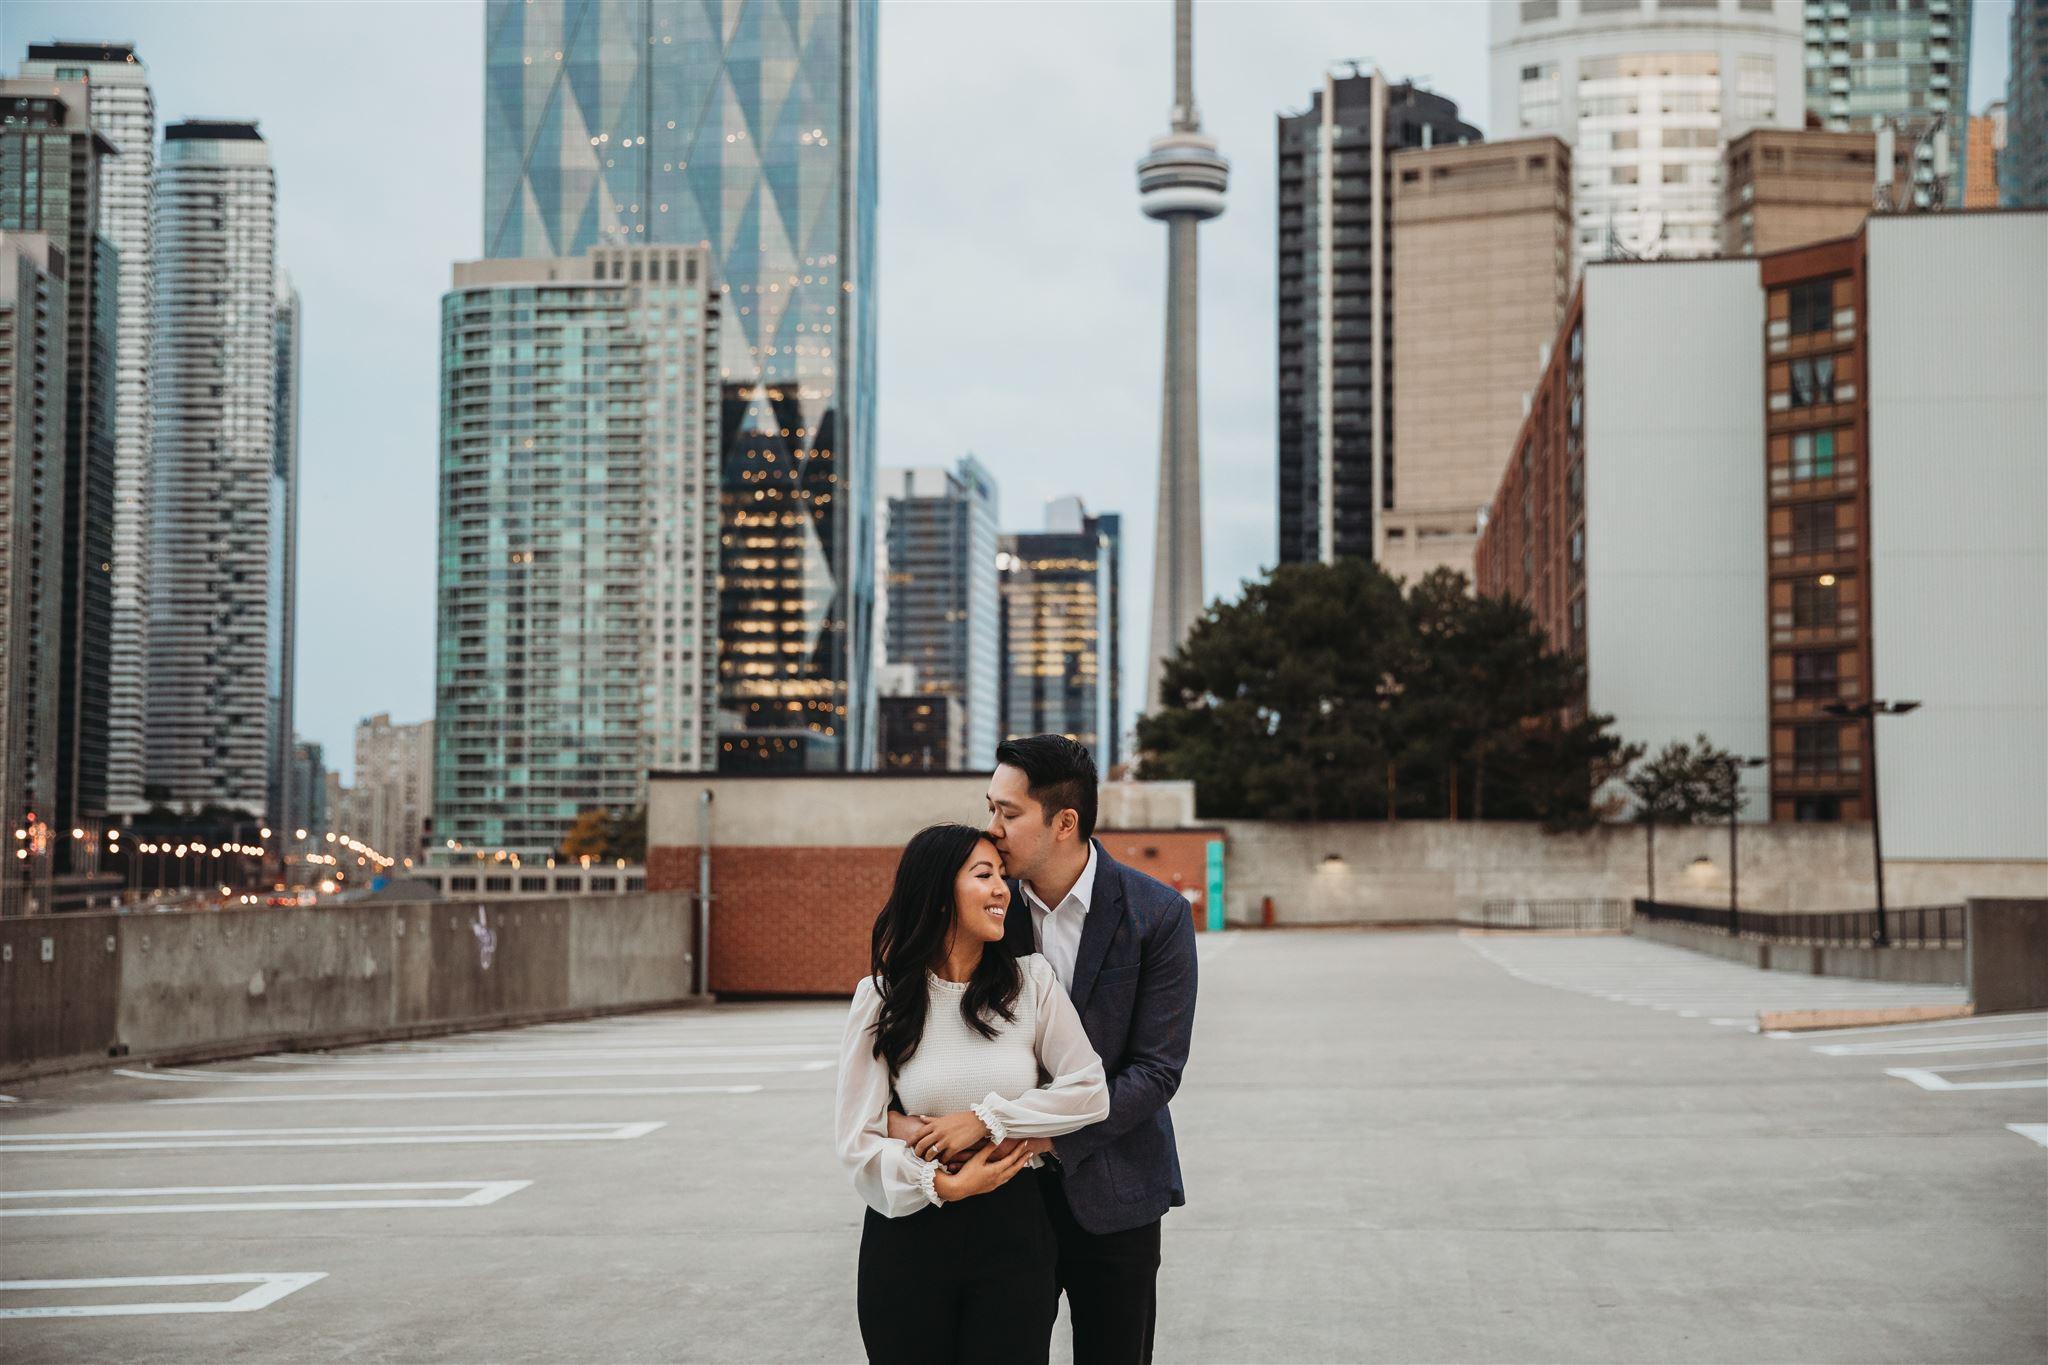 Cost of Wedding Photography in Toronto, Wedding Photography Prices in Toronto